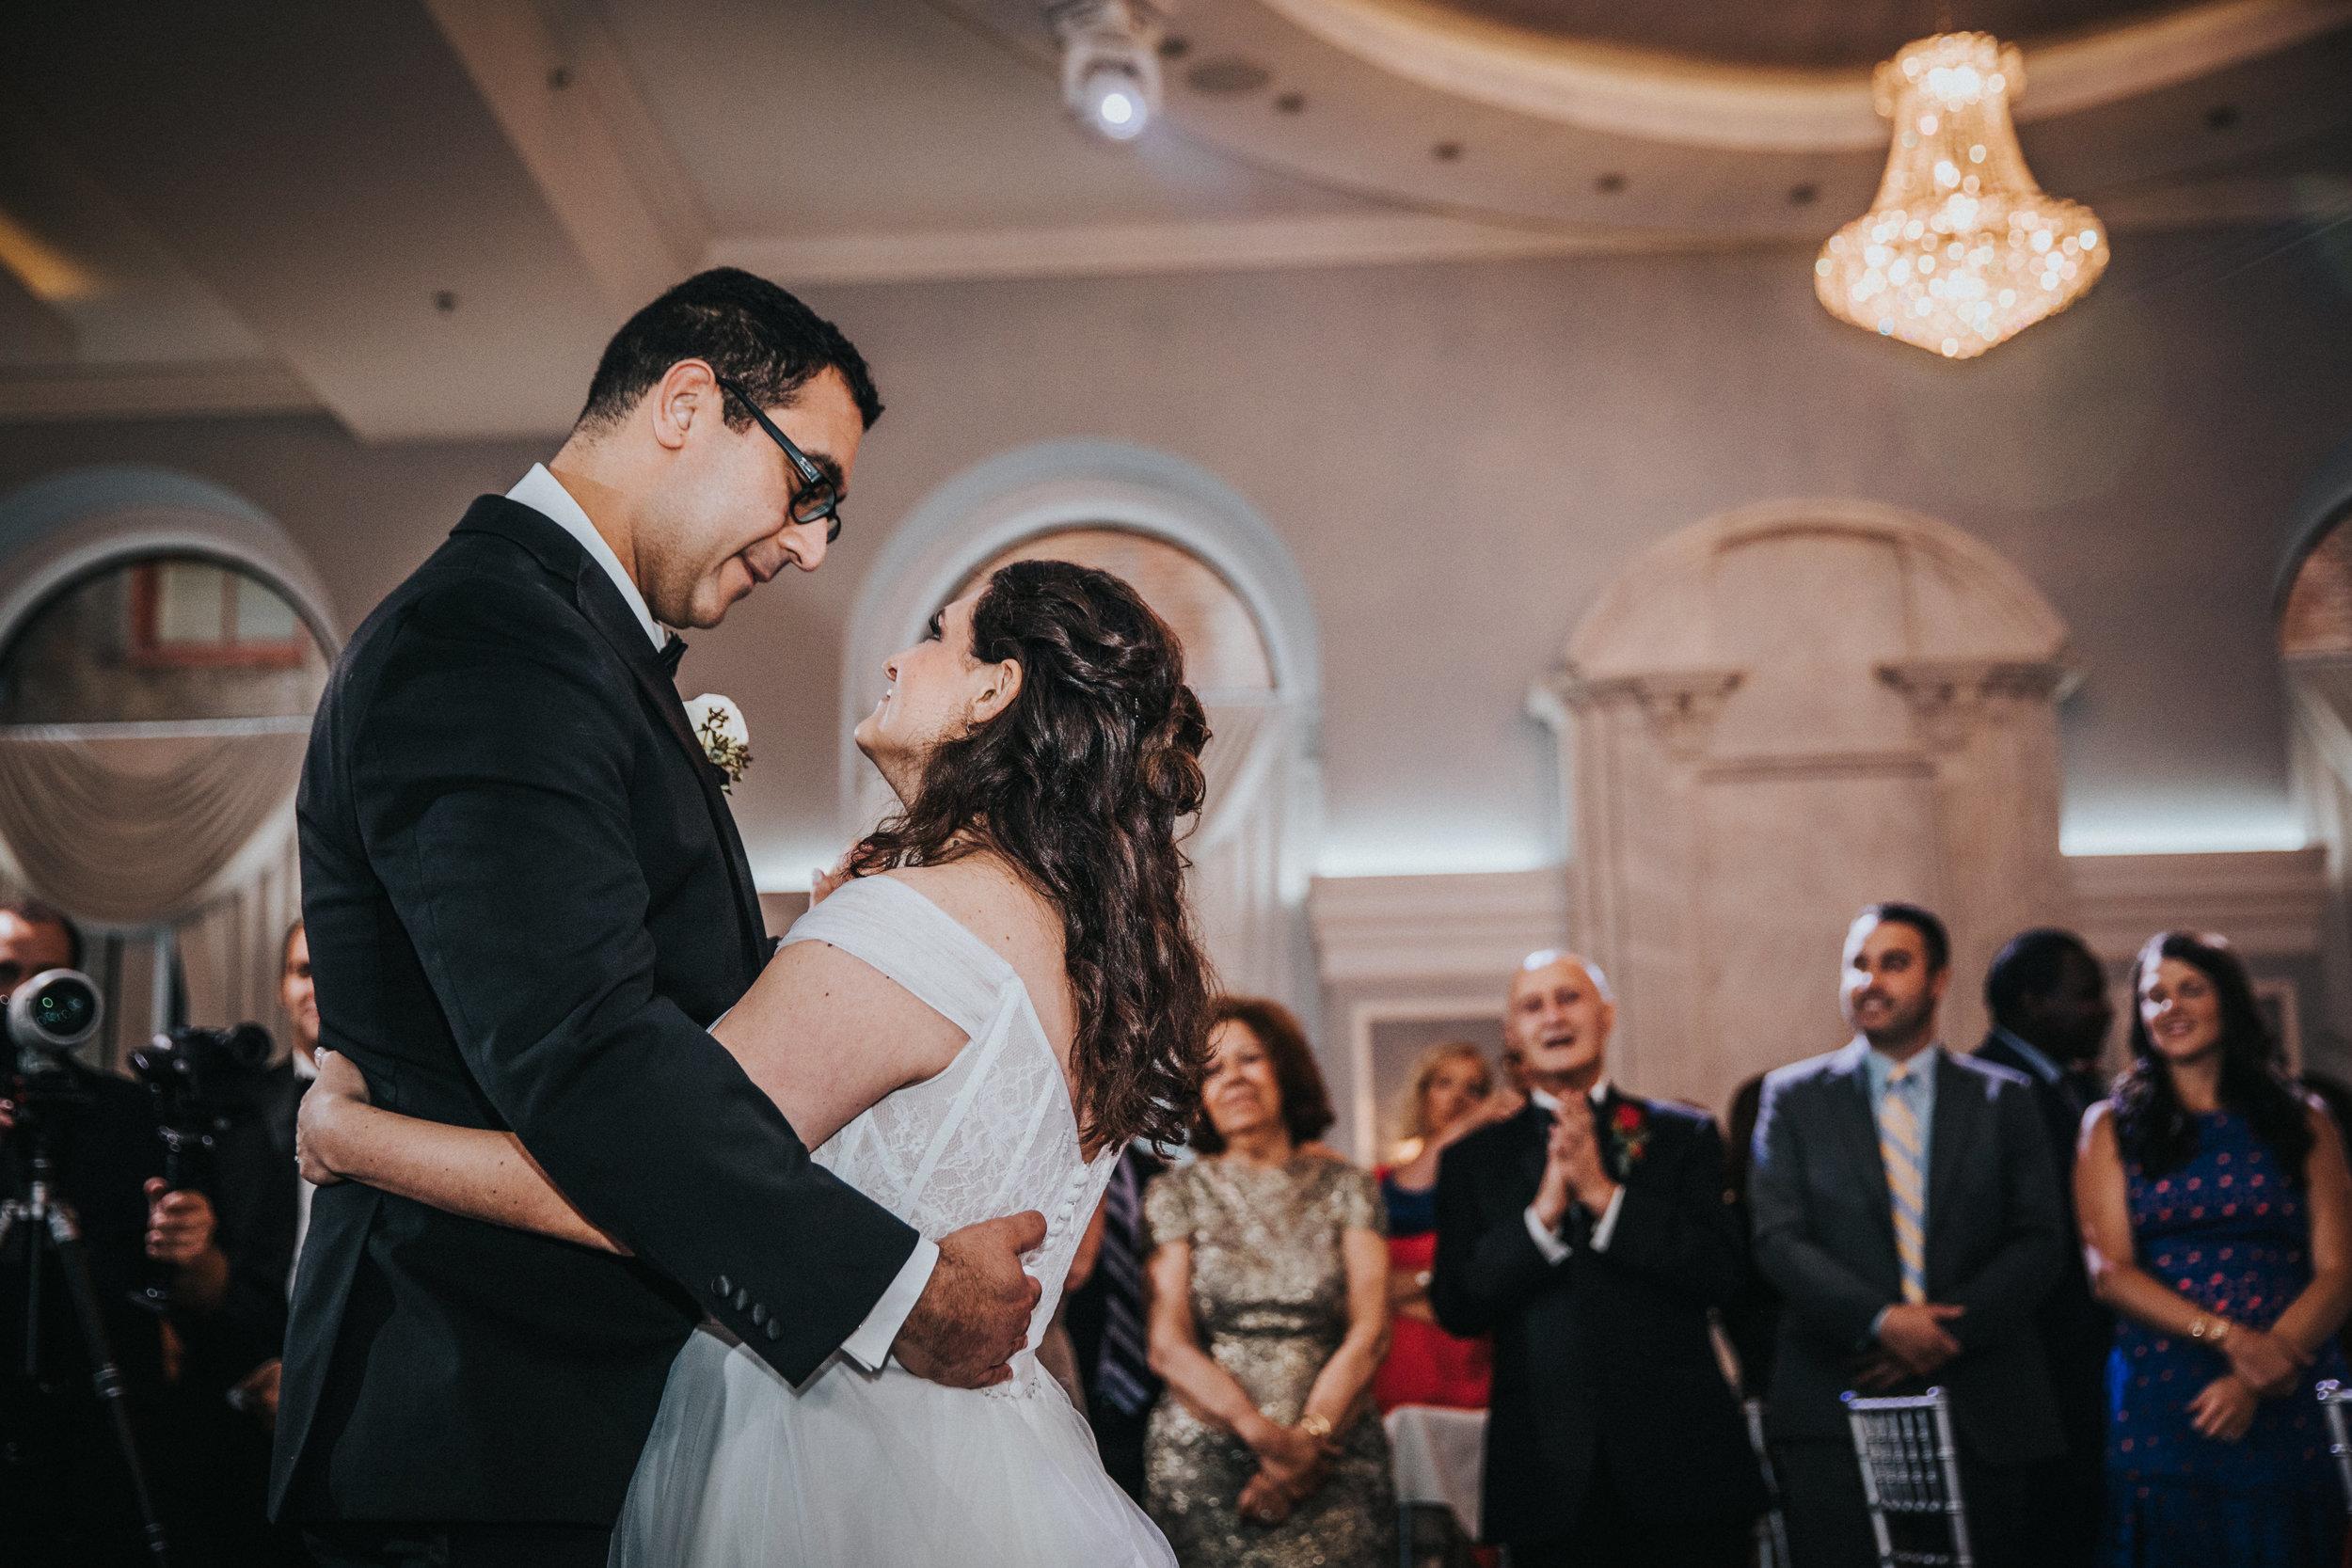 JennaLynnPhotography-NJWeddingPhotographer-Philadelphia-Wedding-ArtsBallroom-Reception-20.jpg